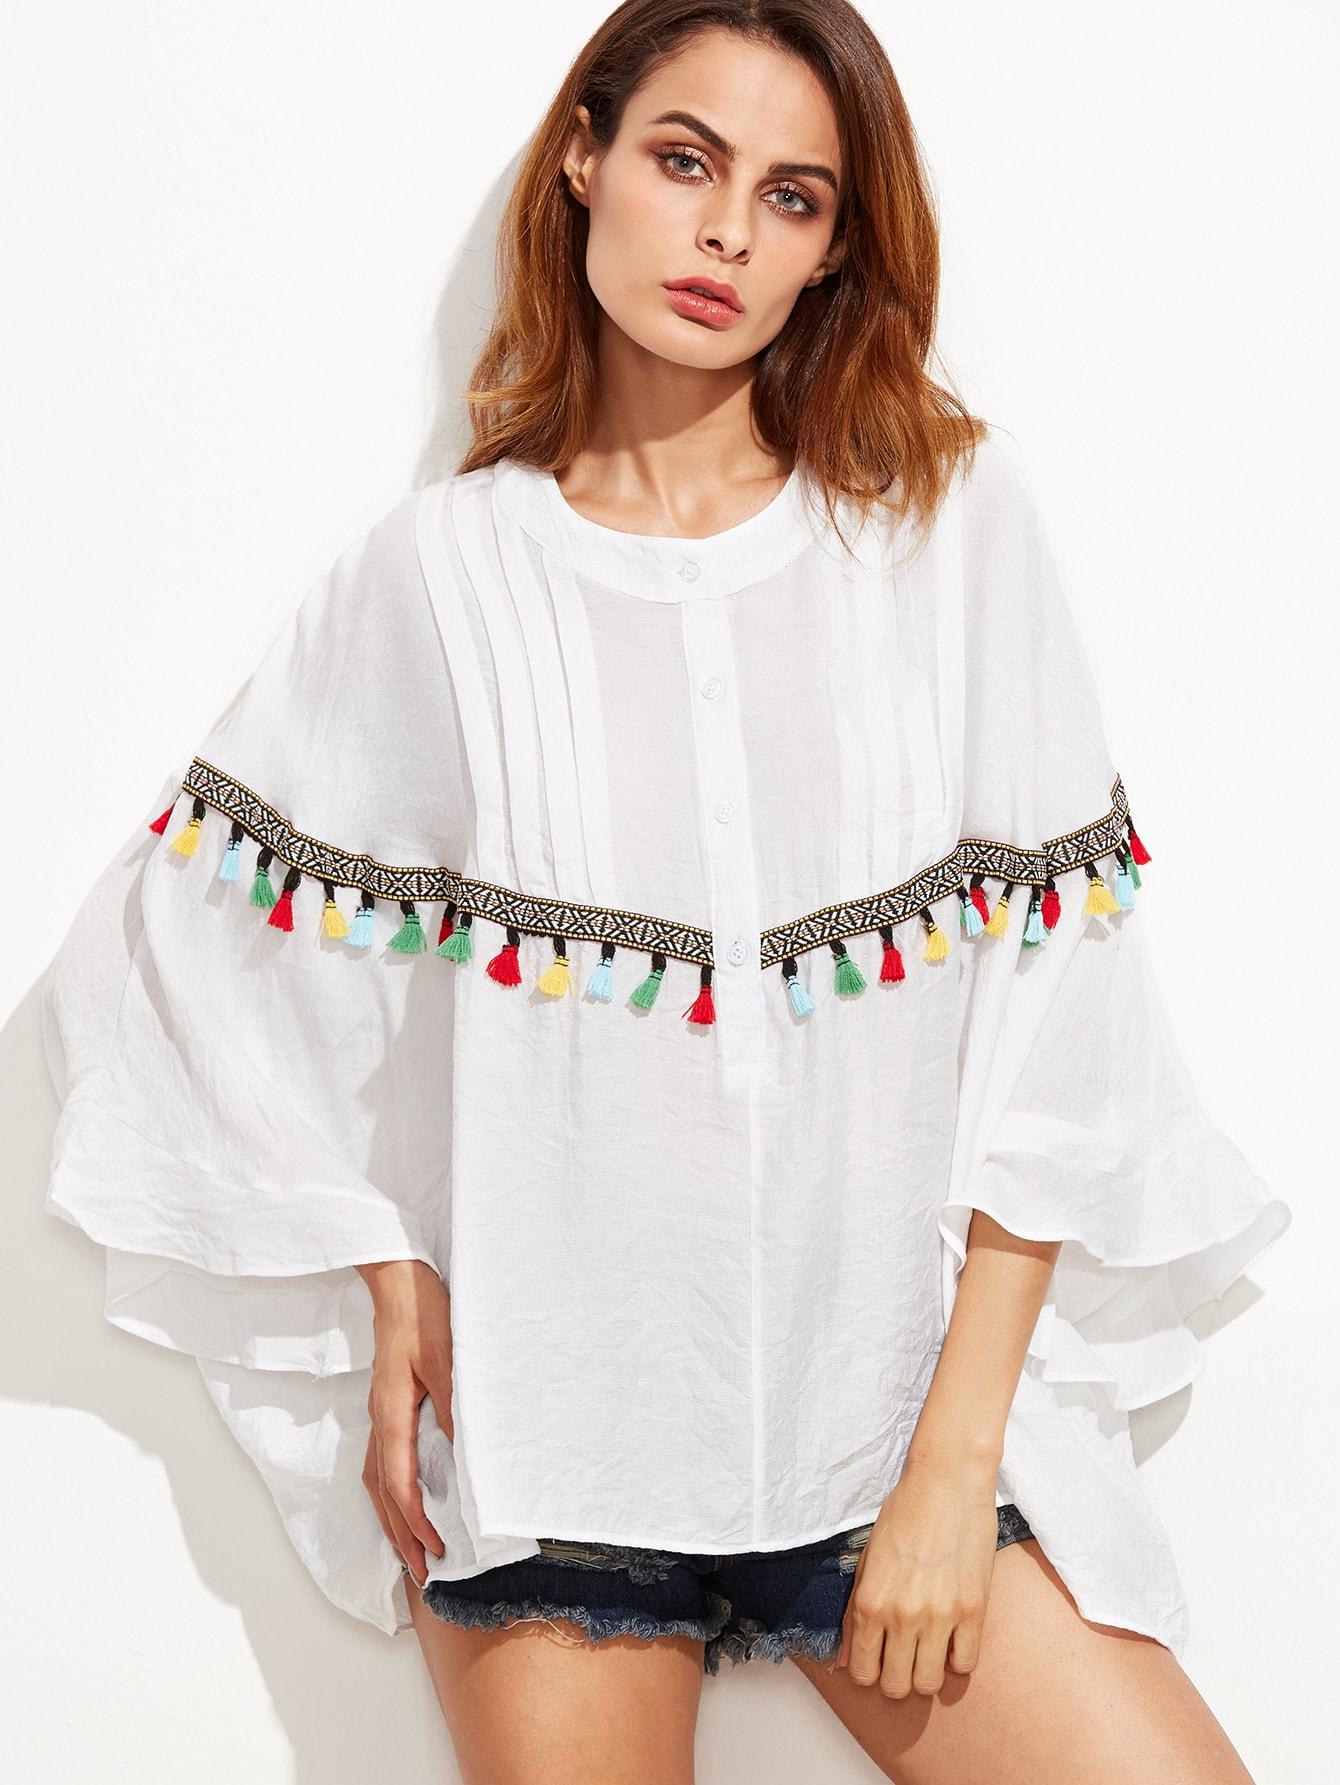 blouse160929403_2